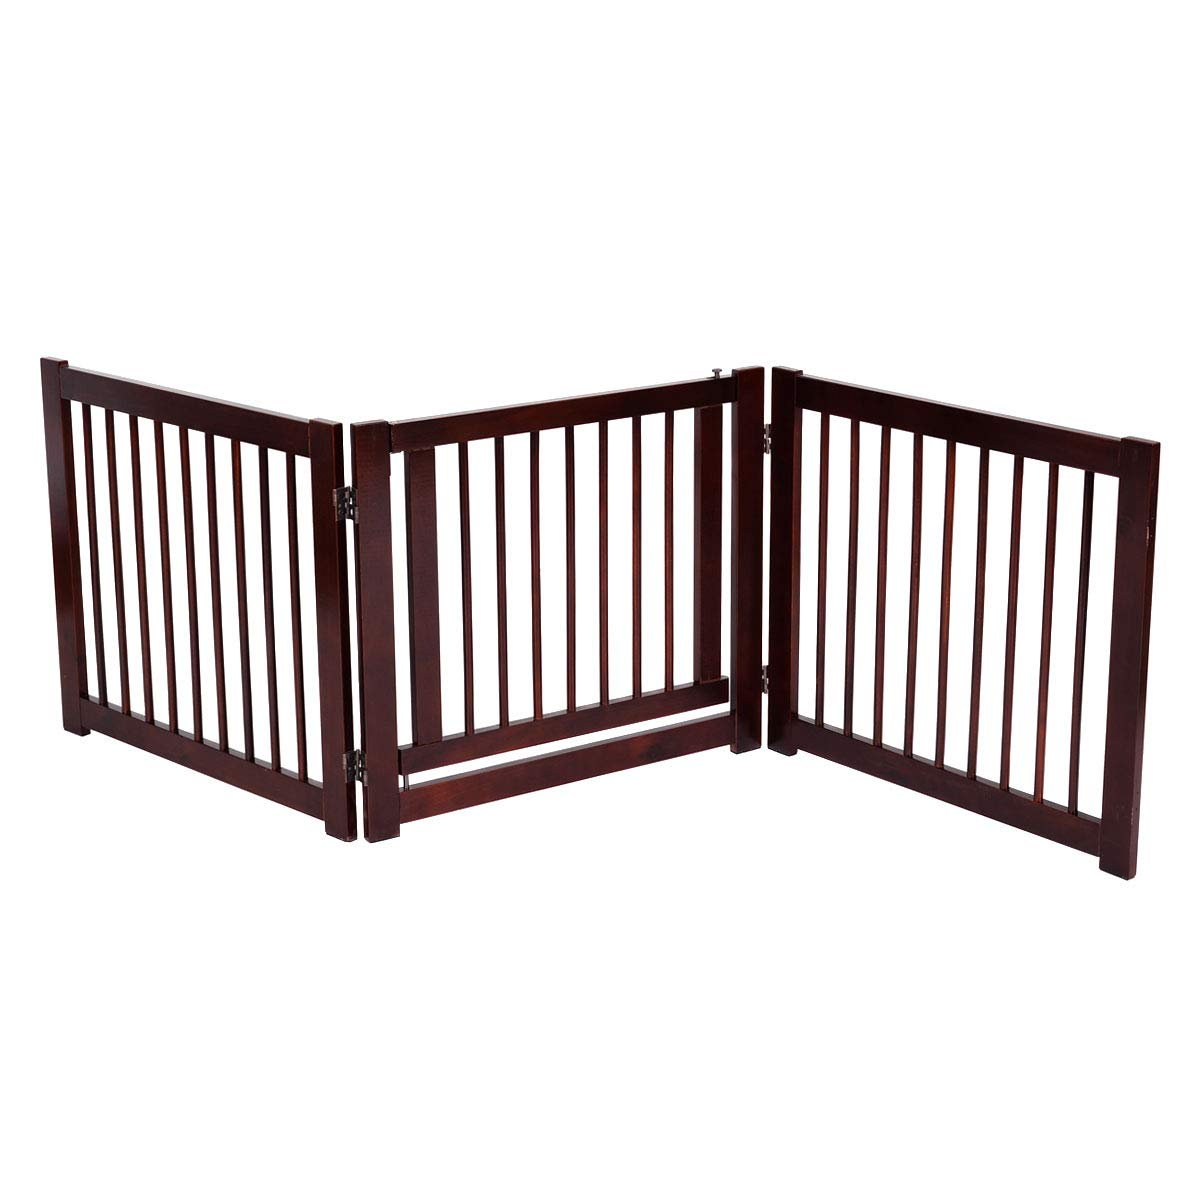 Giantex 24'' Configurable Pet Gate Folding Free Standing 3 Panel Wood Pet Dog Safety Fence w/Gate